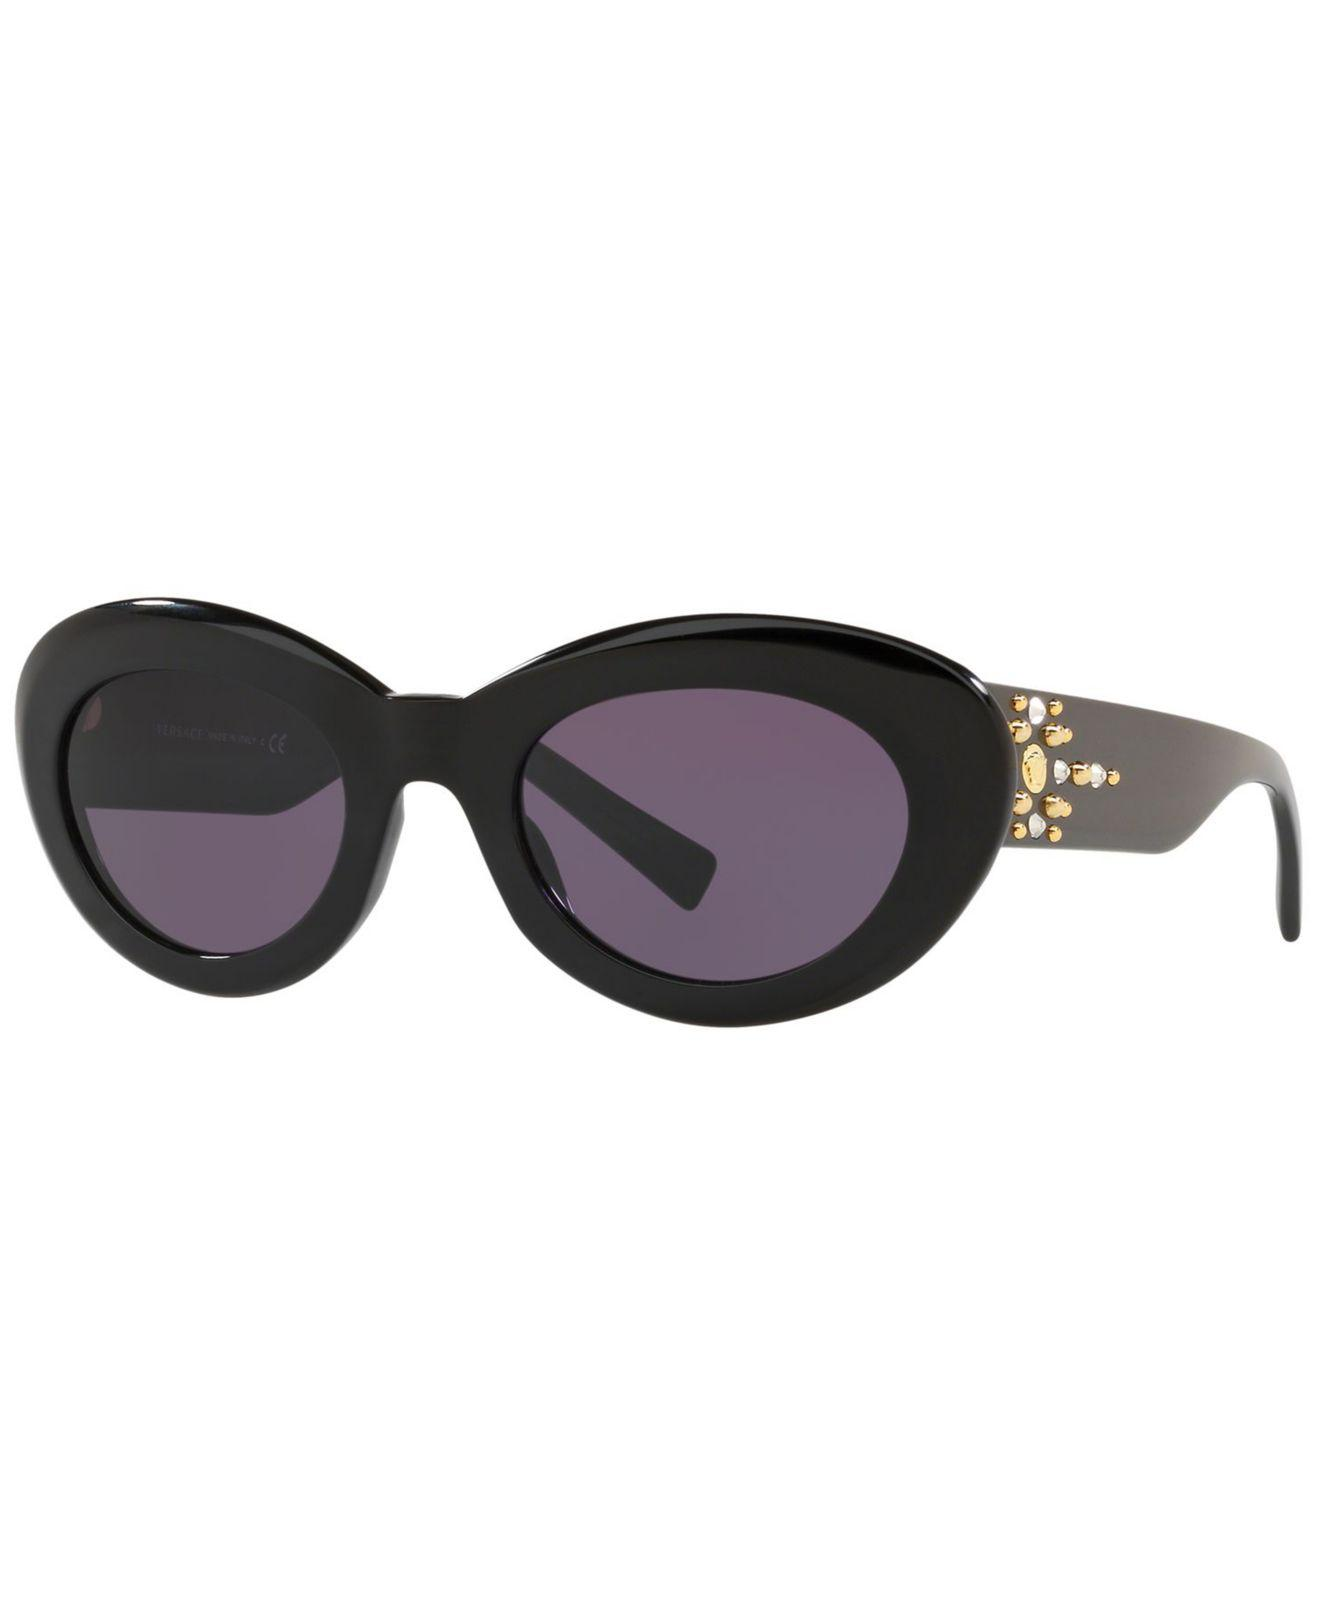 7c2be3fa55 Versace. Women s Black Sunglasses ...